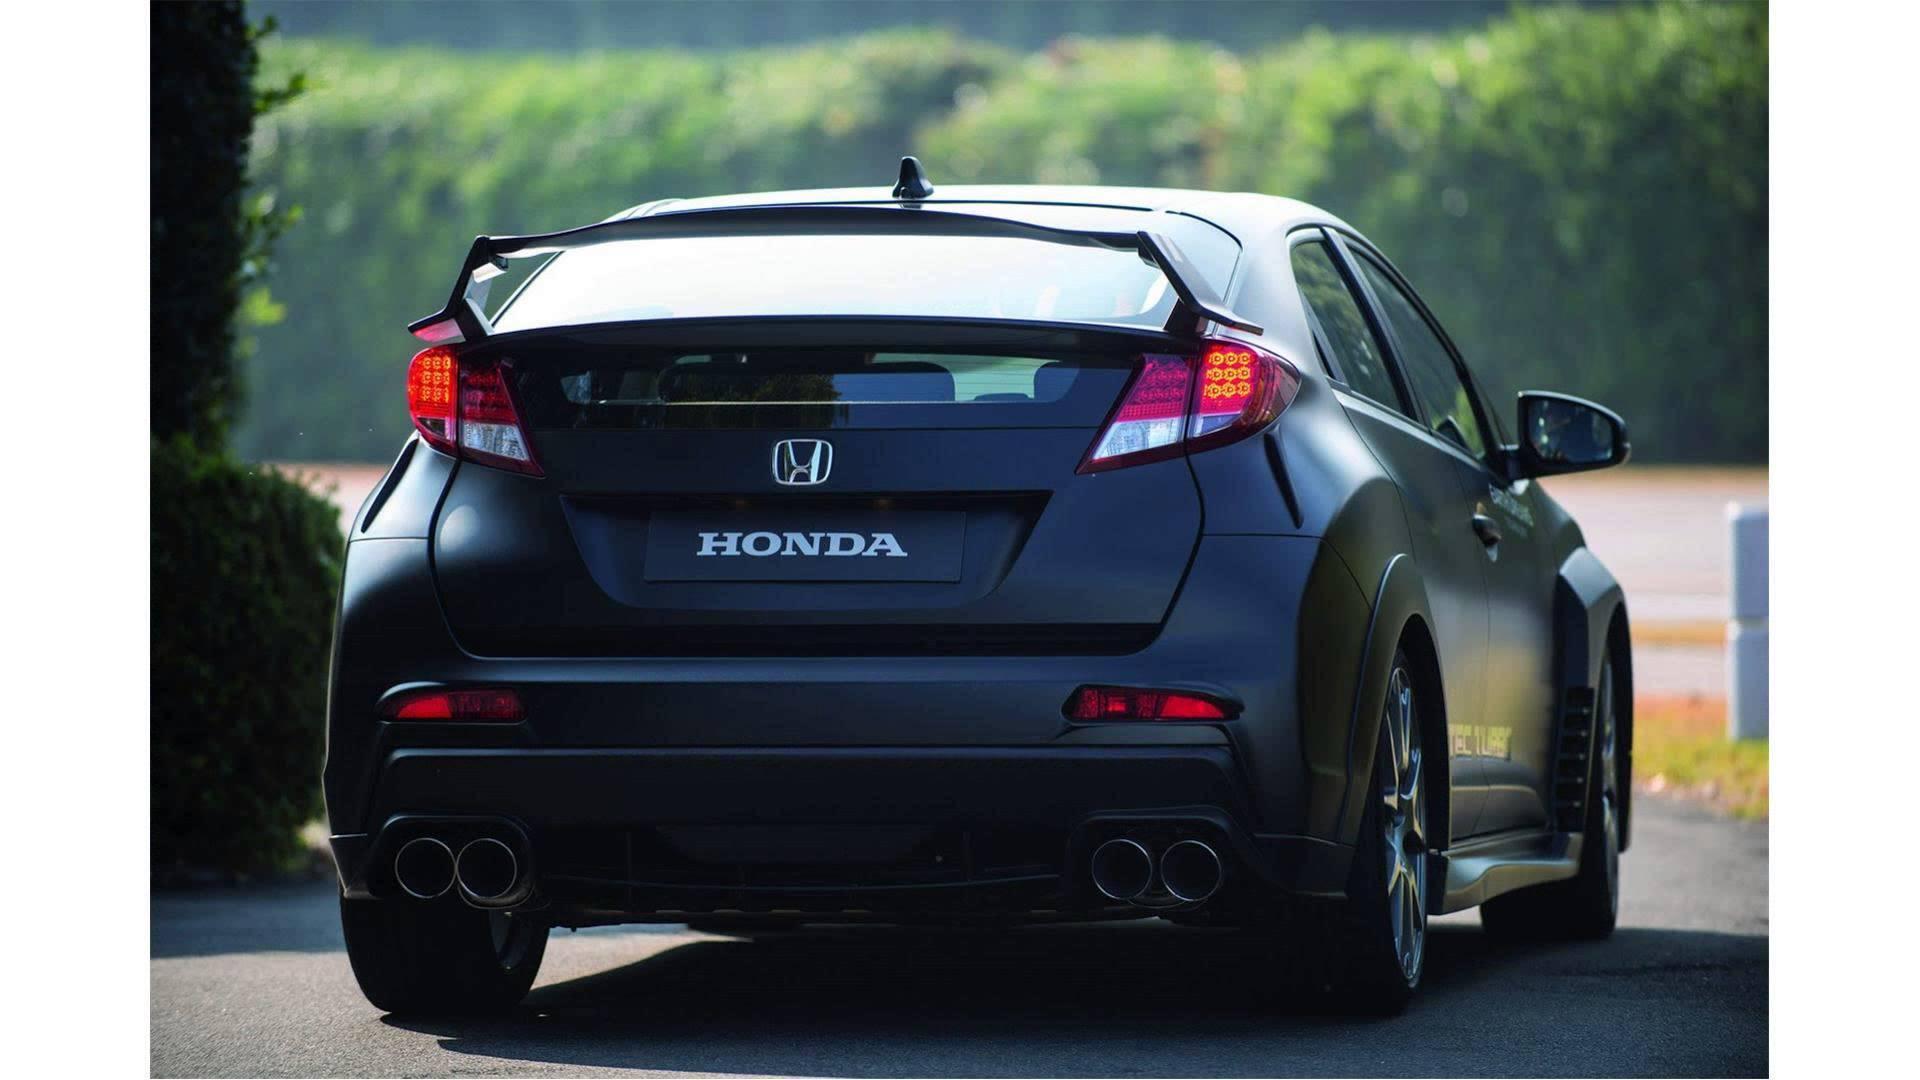 2015 Honda Civic Type R Mobile Wallpaper 4149   Grivucom 1920x1080